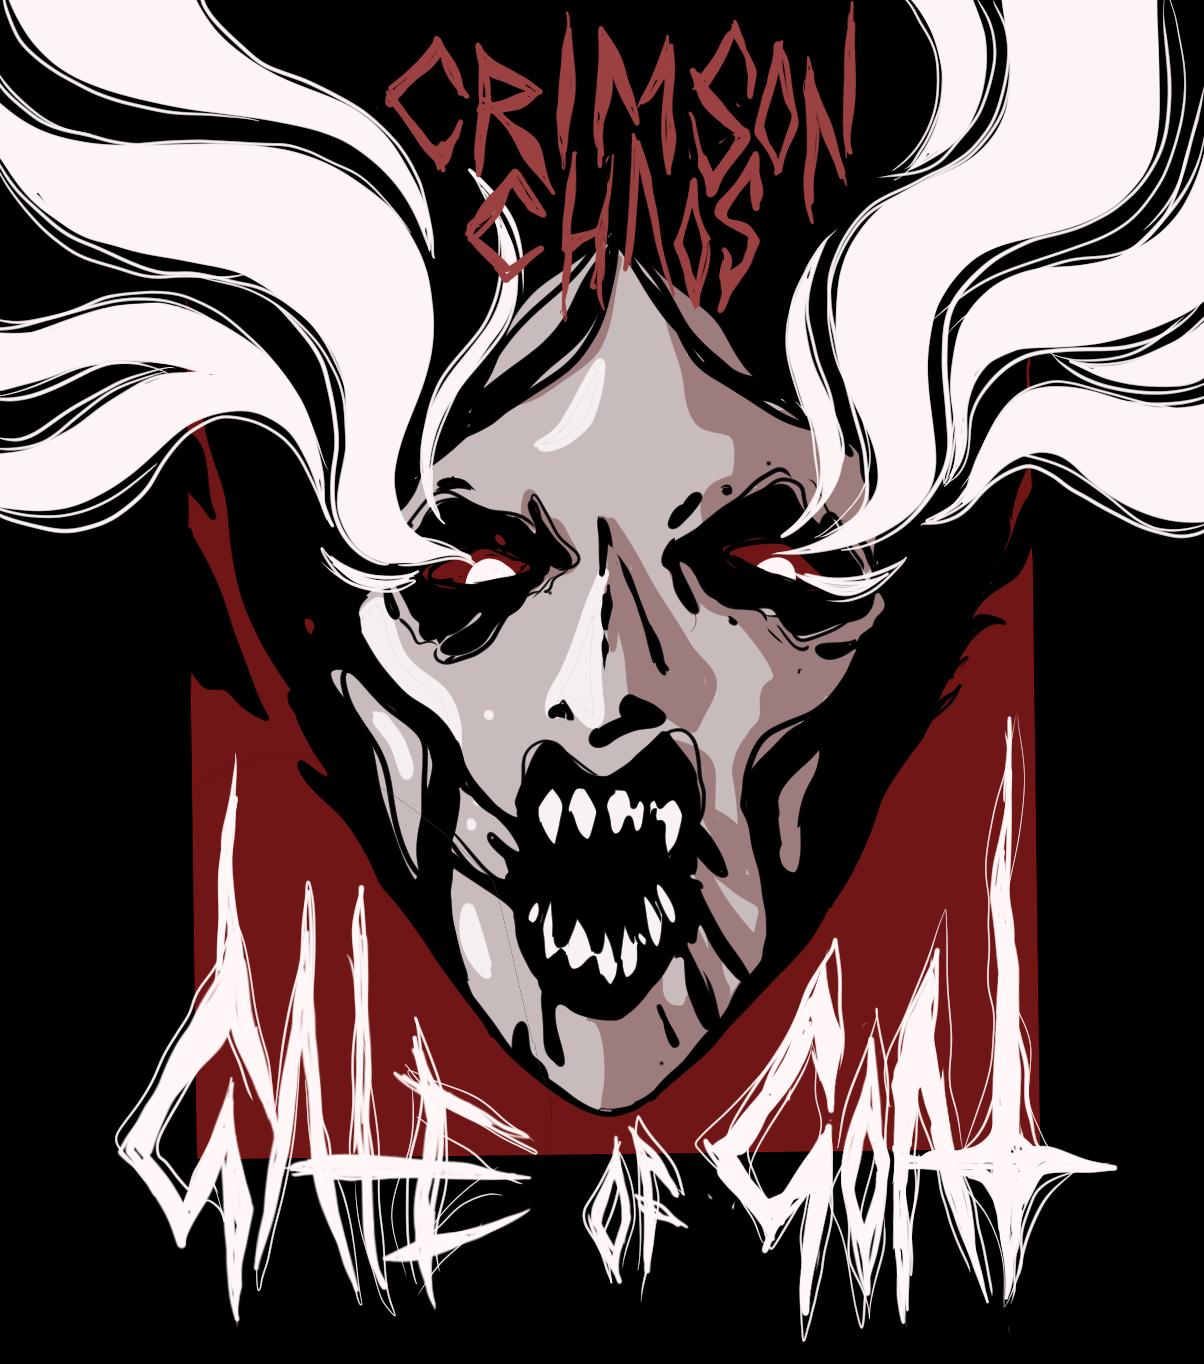 Gate of Goat - Crimson Chaos